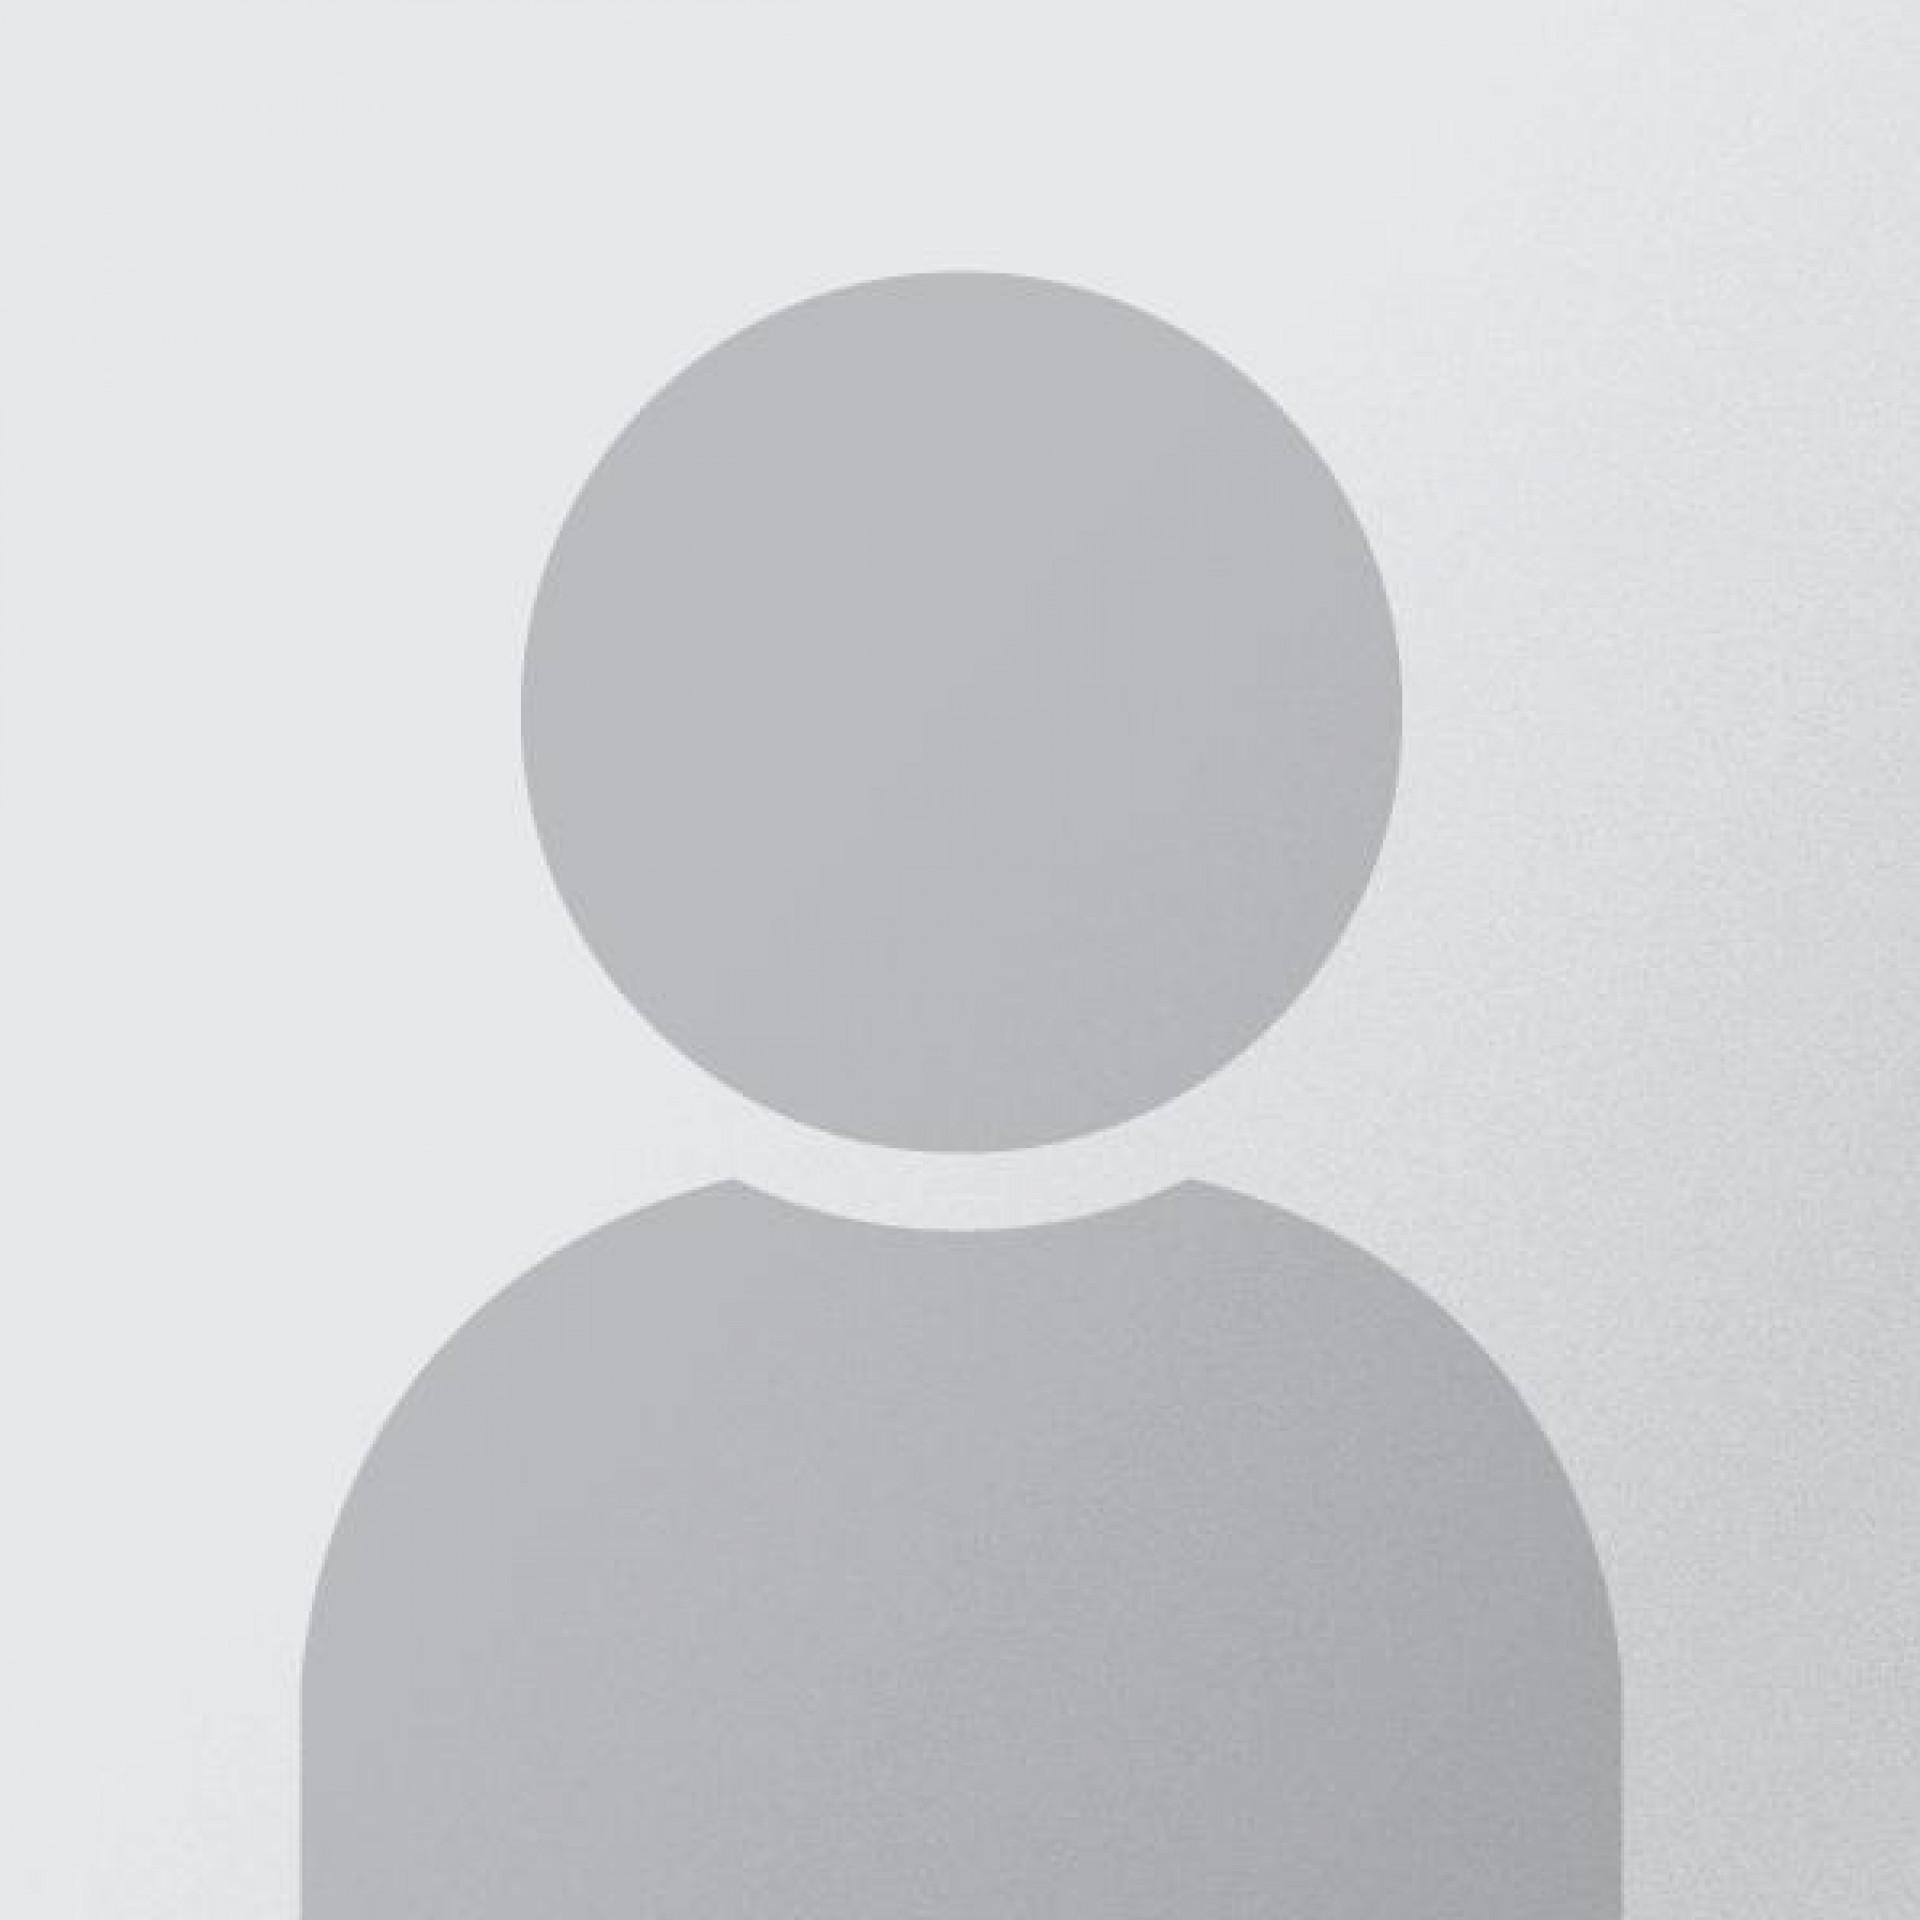 fotografia p021 profilu 0102Q4Z4KG